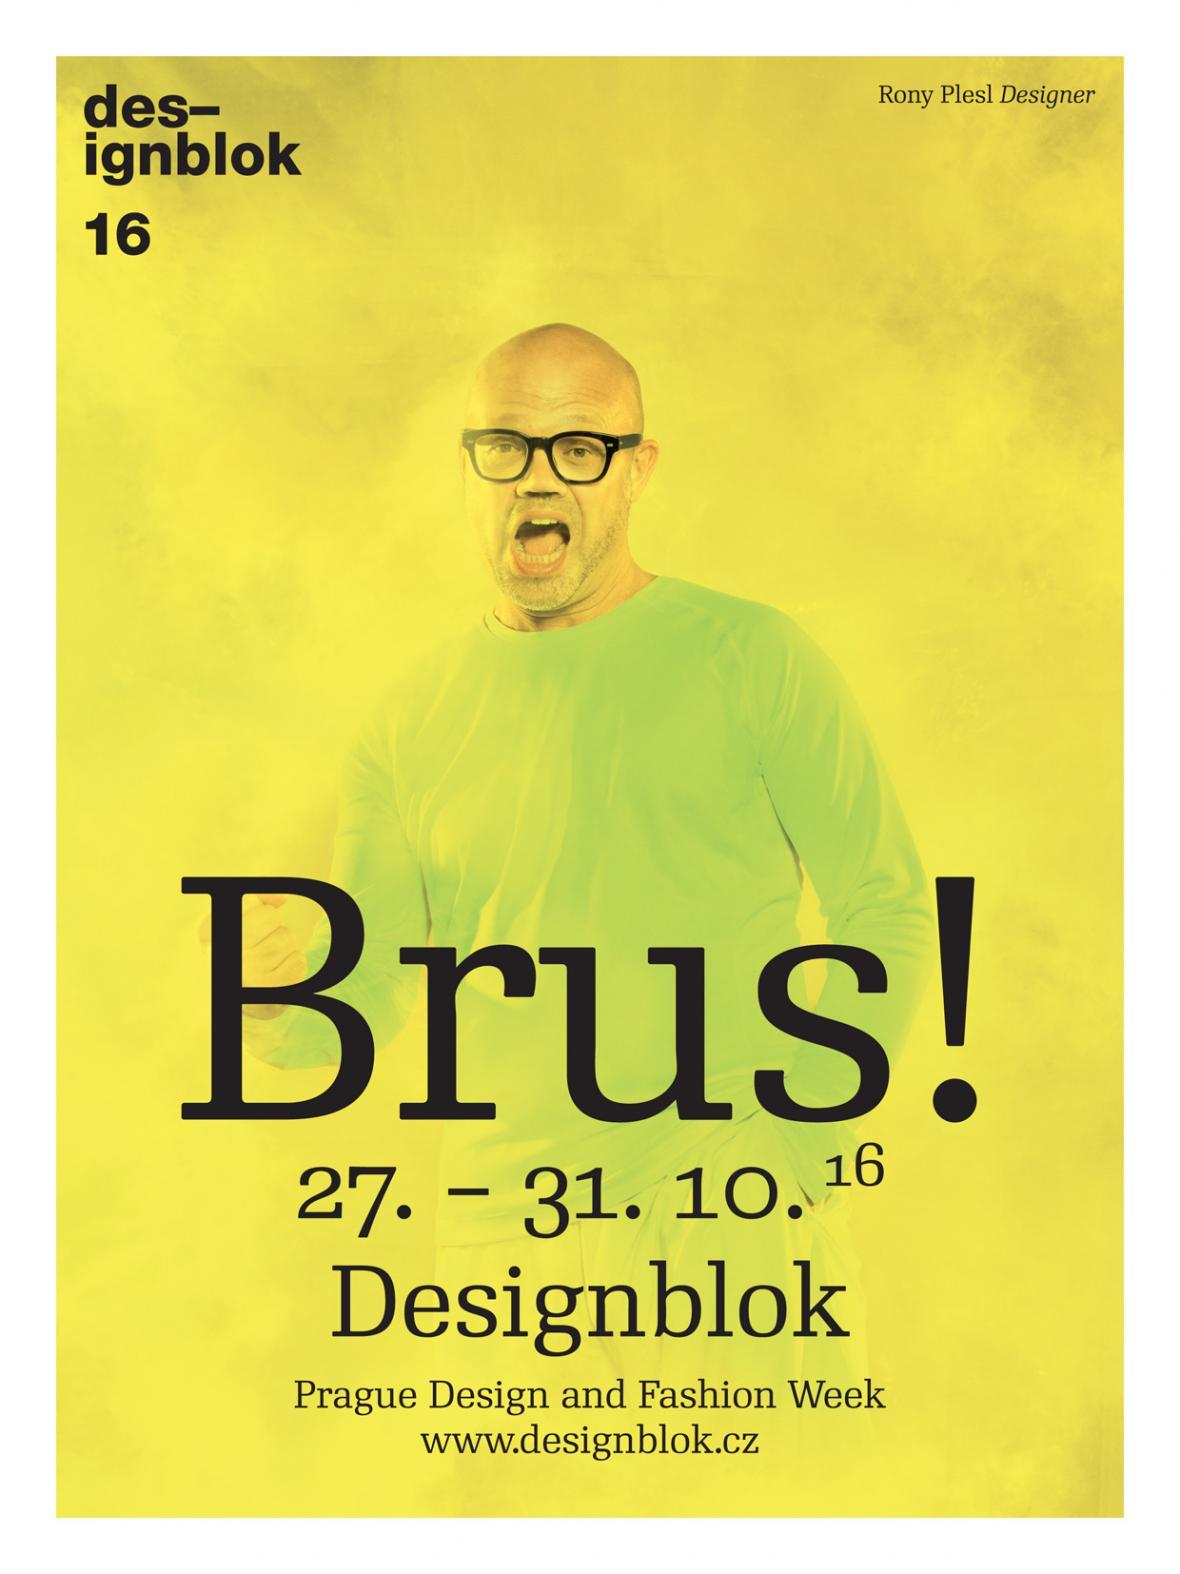 Designblok / Rony Plesl